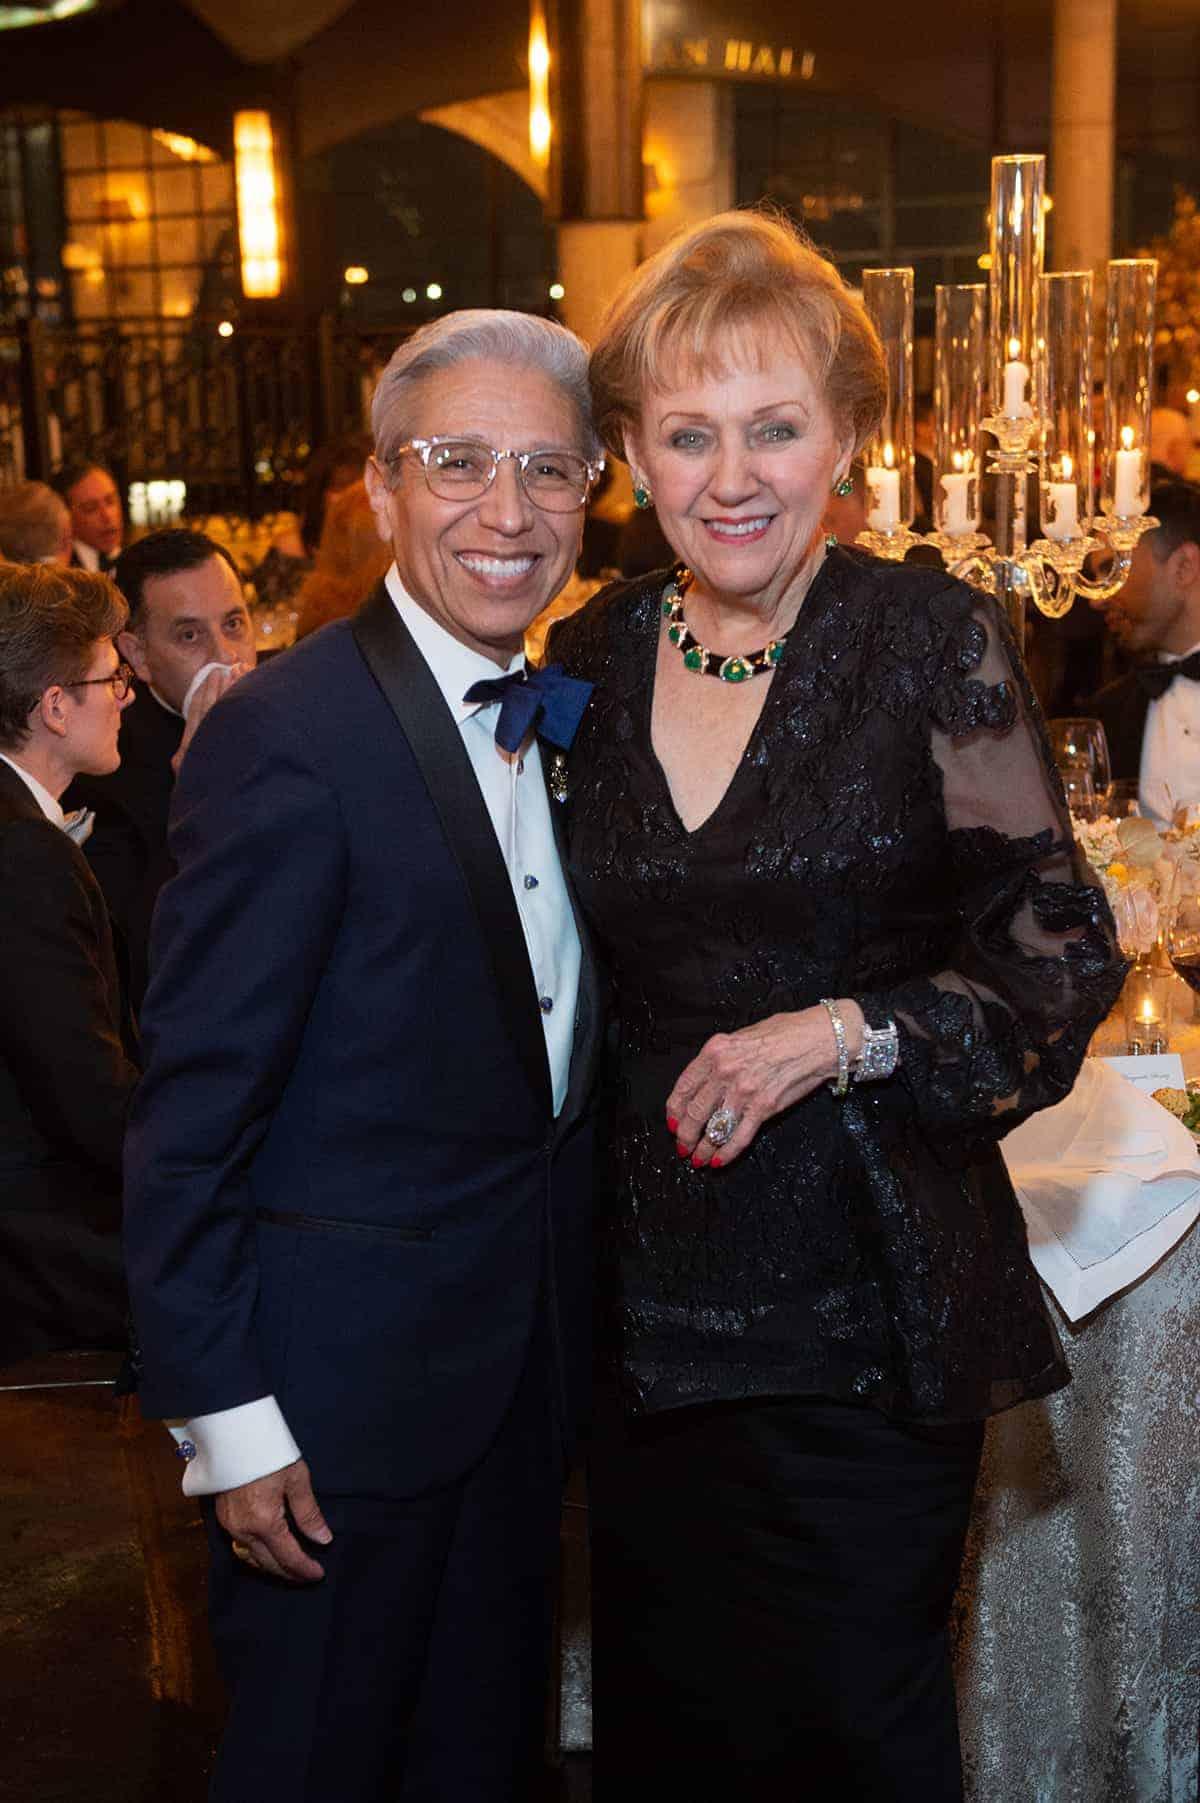 Rudy Hernandez and Margurite Swartz